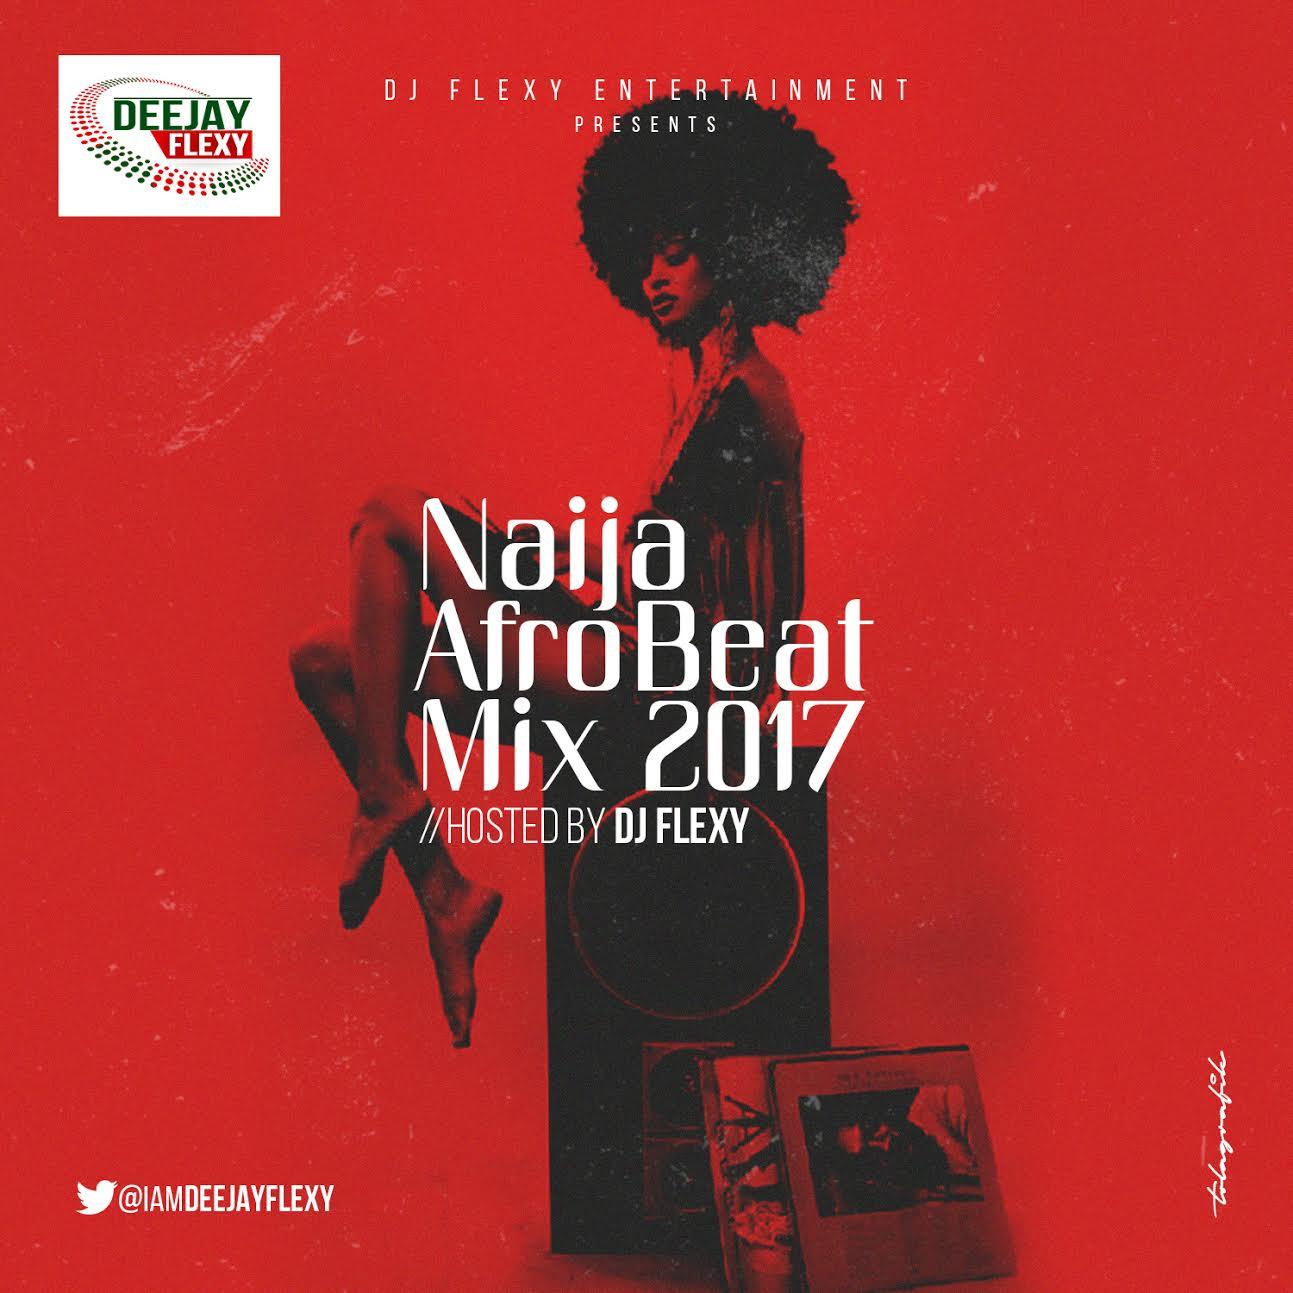 FACTORY78: MIX DOWNLOAD (MIXTAPE): DJ Flexy - Naija AfroBeat Mix 2017